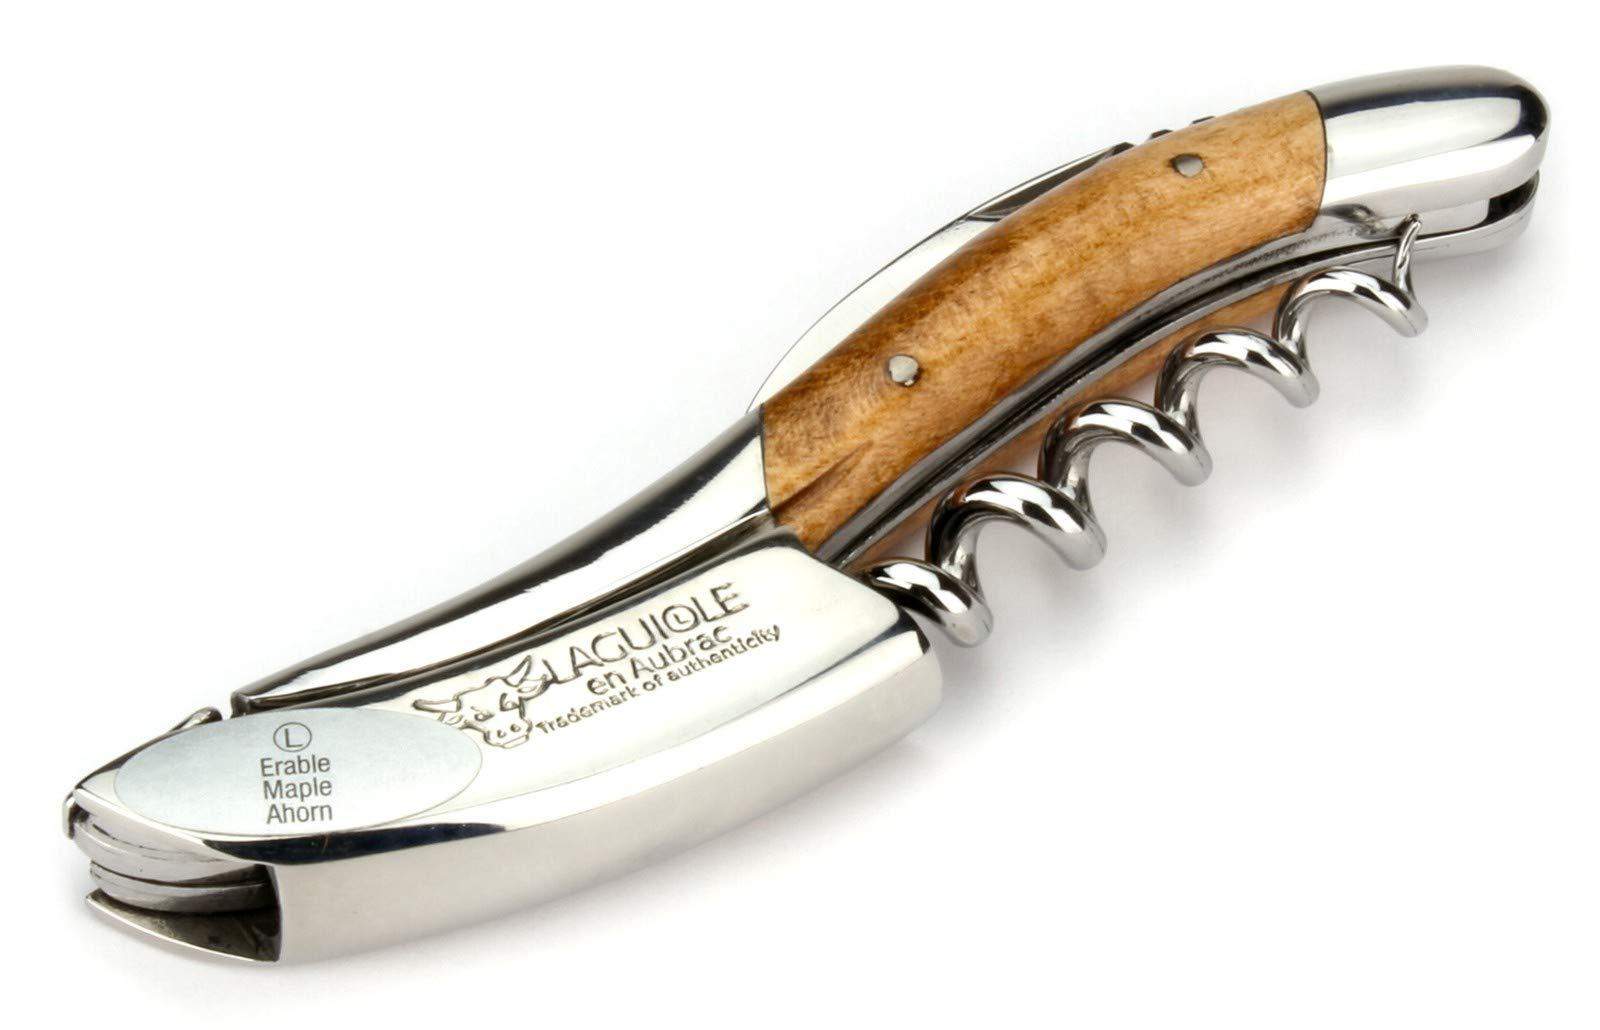 Laguiole en Aubrac corkscrew sommelier waiters knife - handles flamed maple - 3 functions - stainless steel shiny